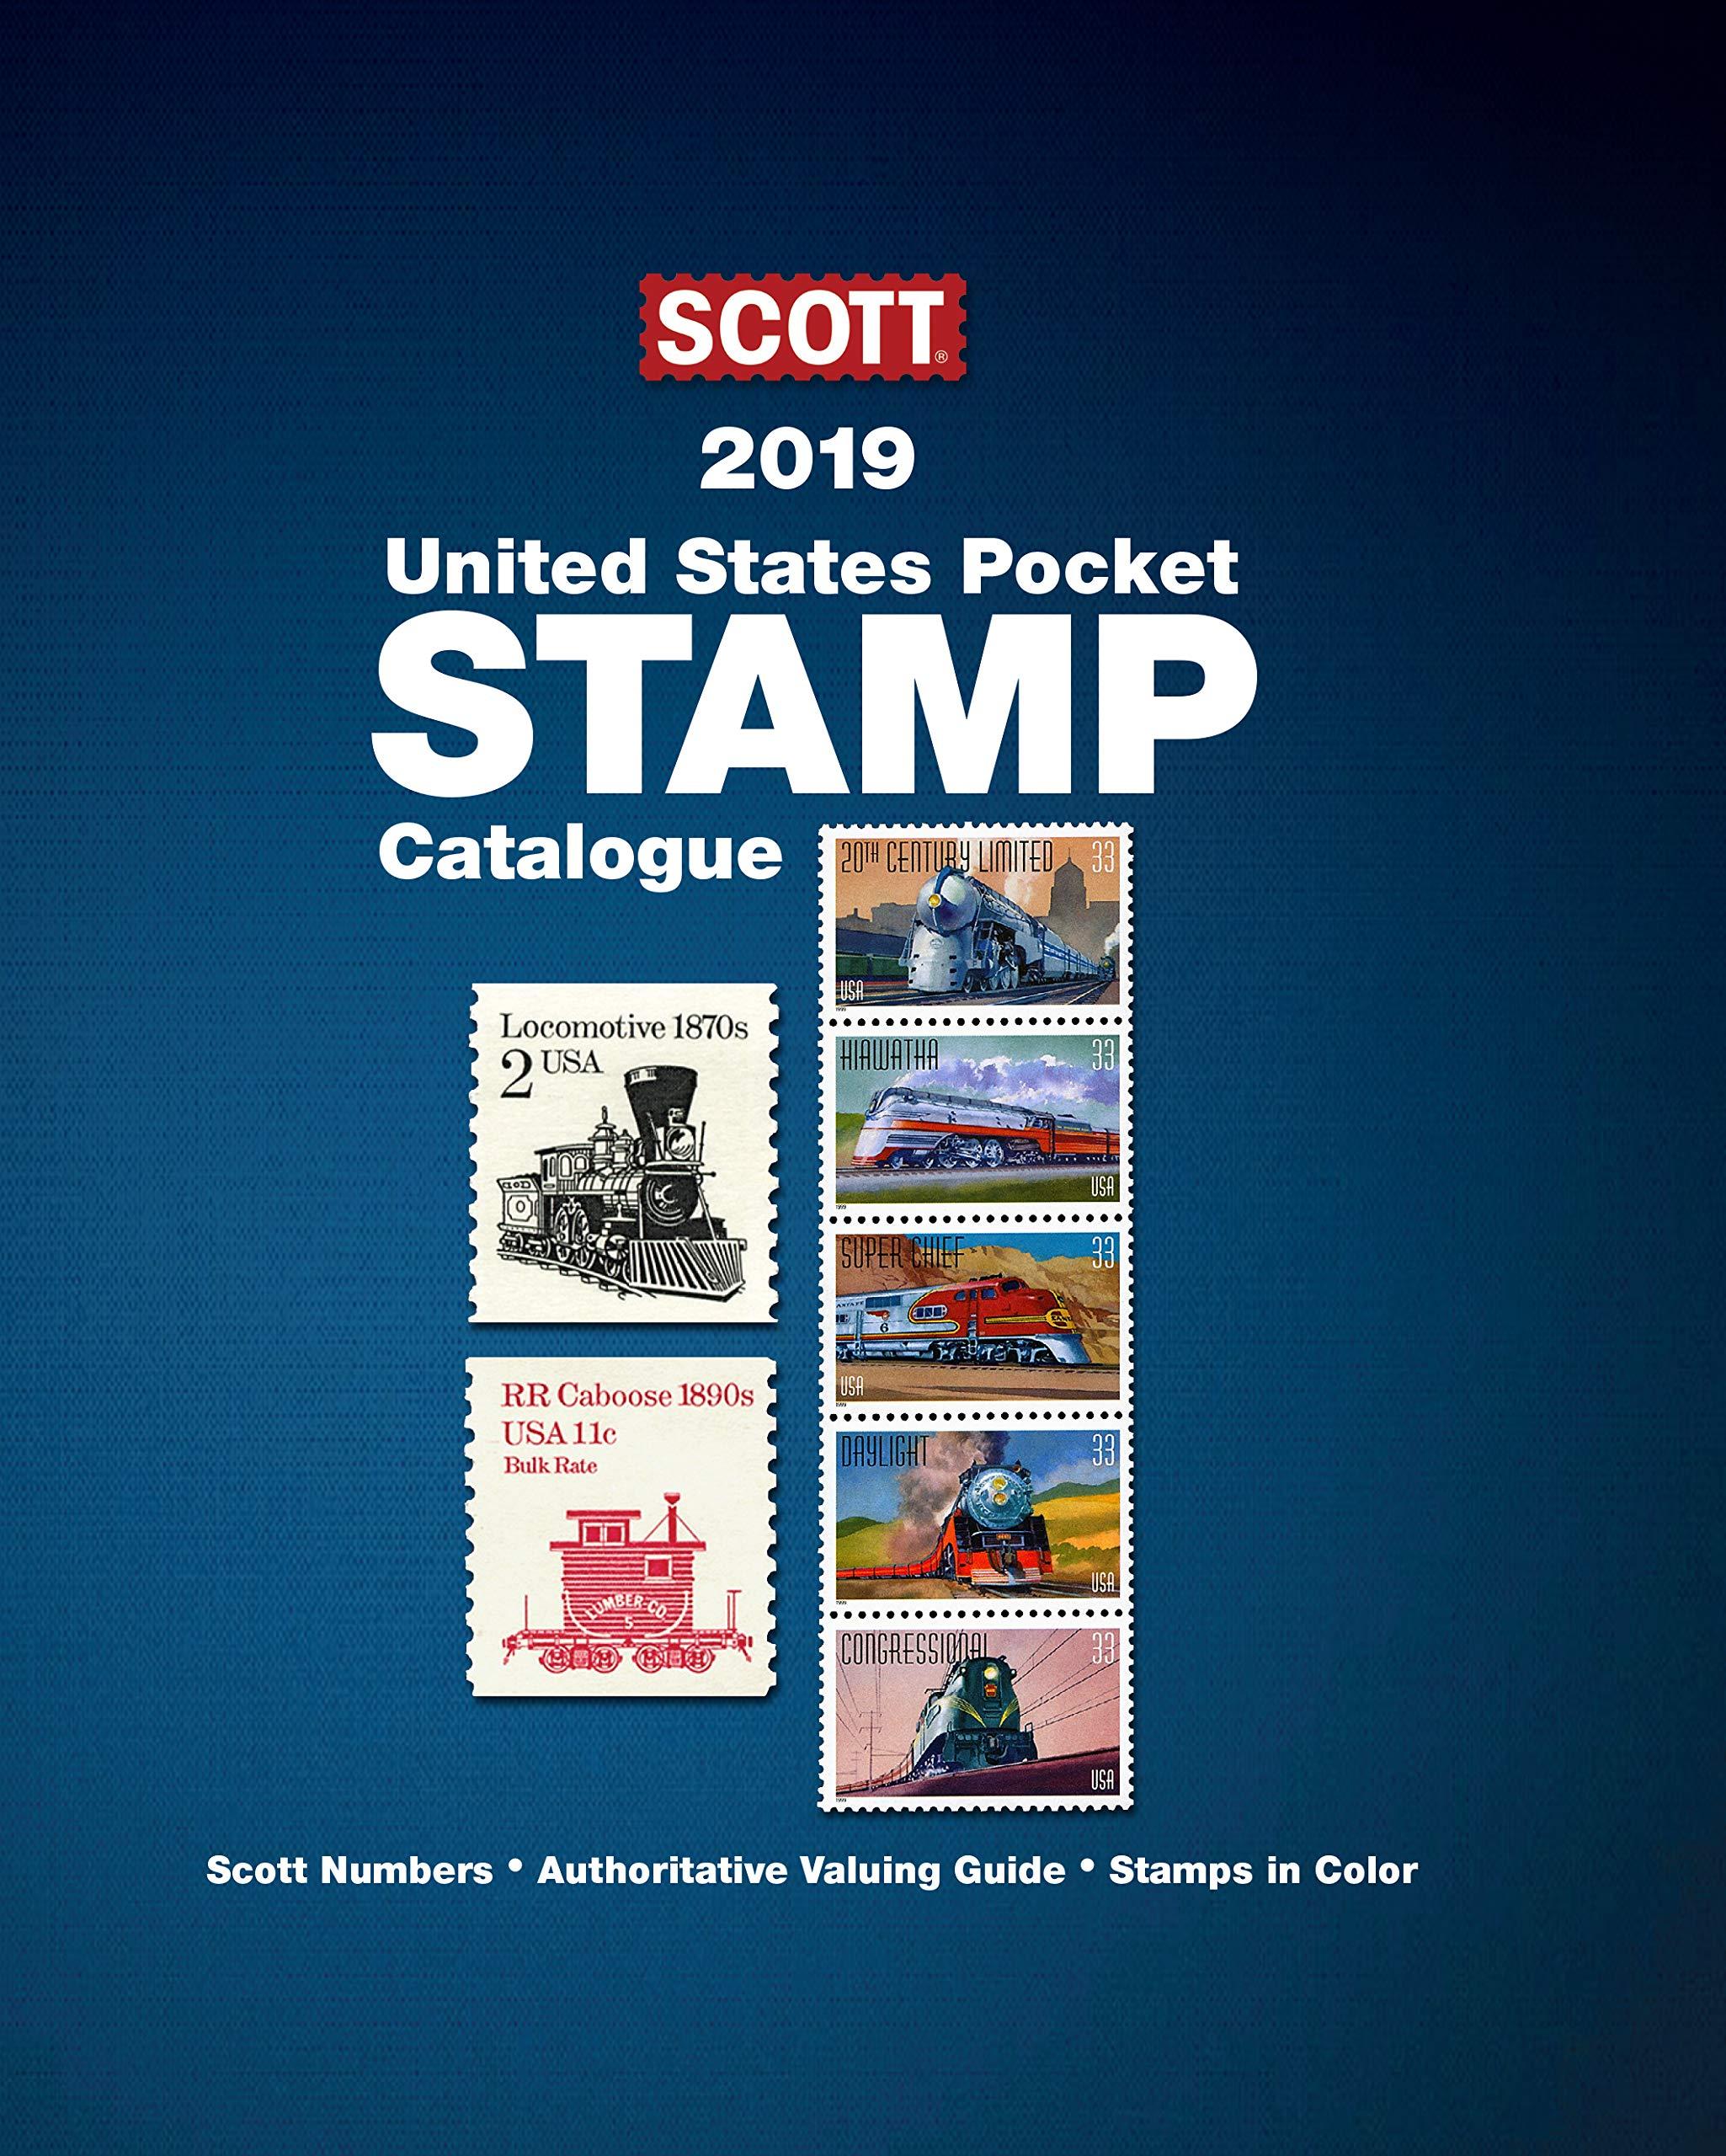 2019 Scott United States Pocket Stamp Catalogue (Scott Catalogues)